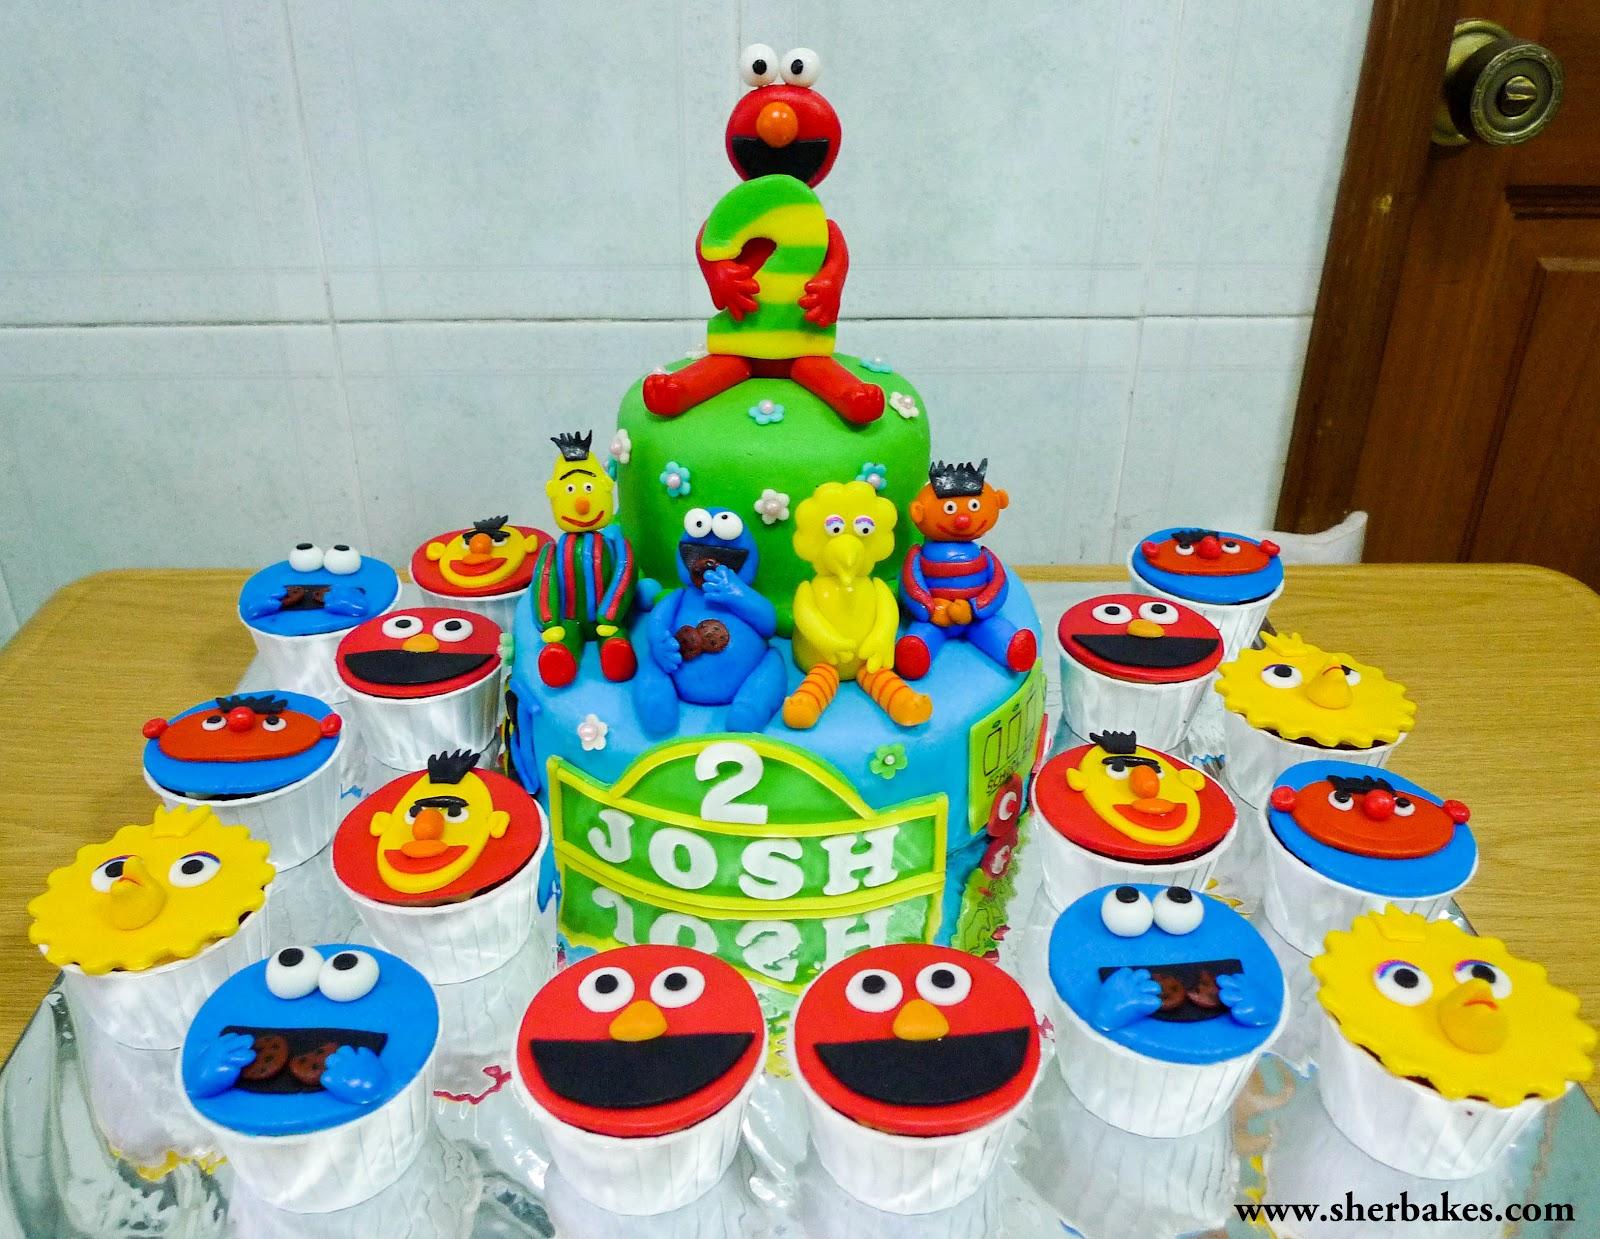 Sherbakes Sesame Street Cake Cupcakes